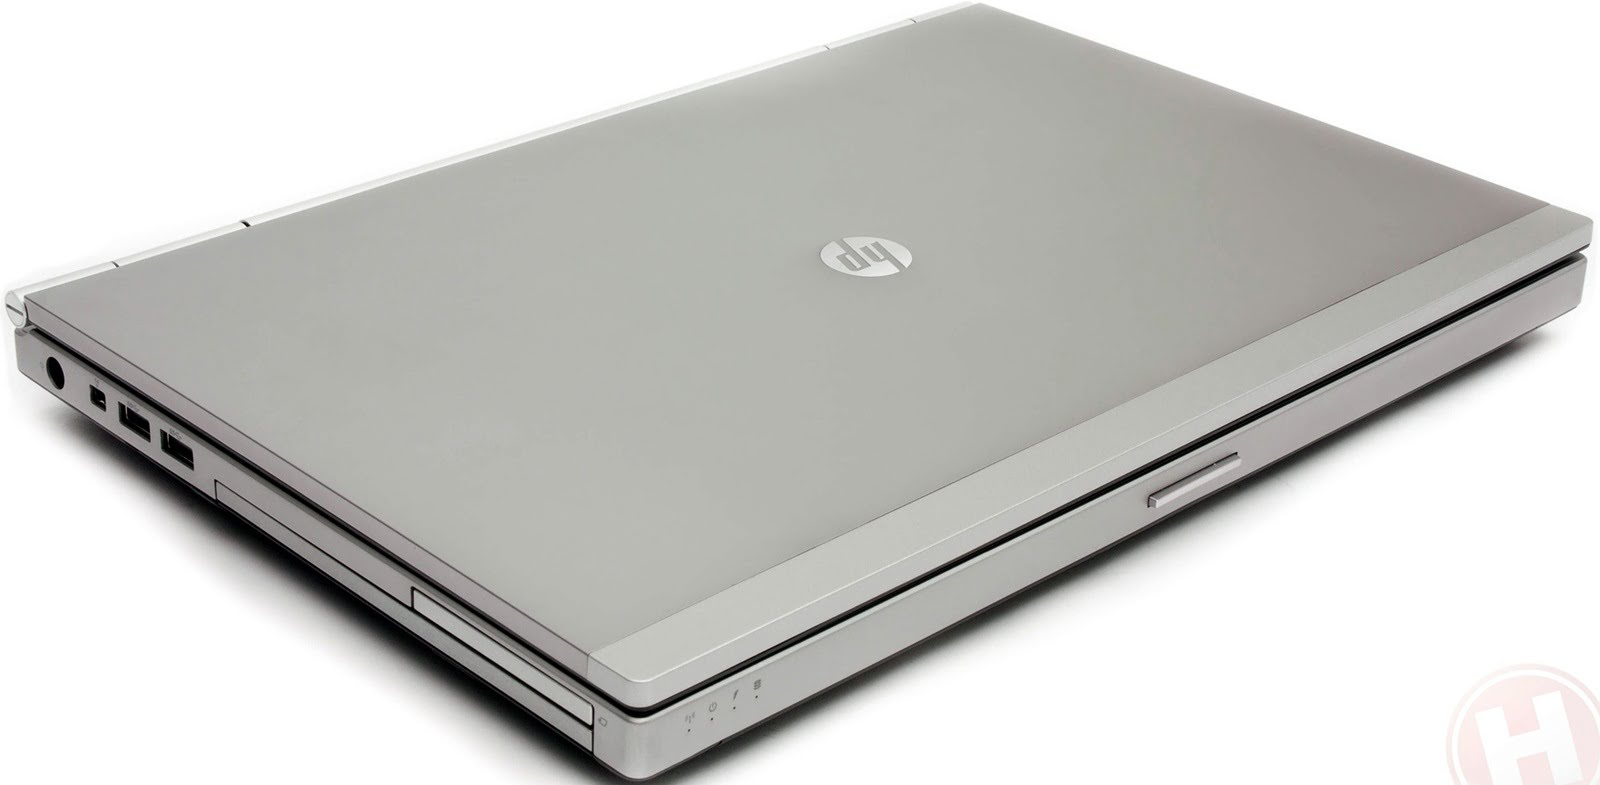 Vỏ Laptop HP Elitebook 8460p